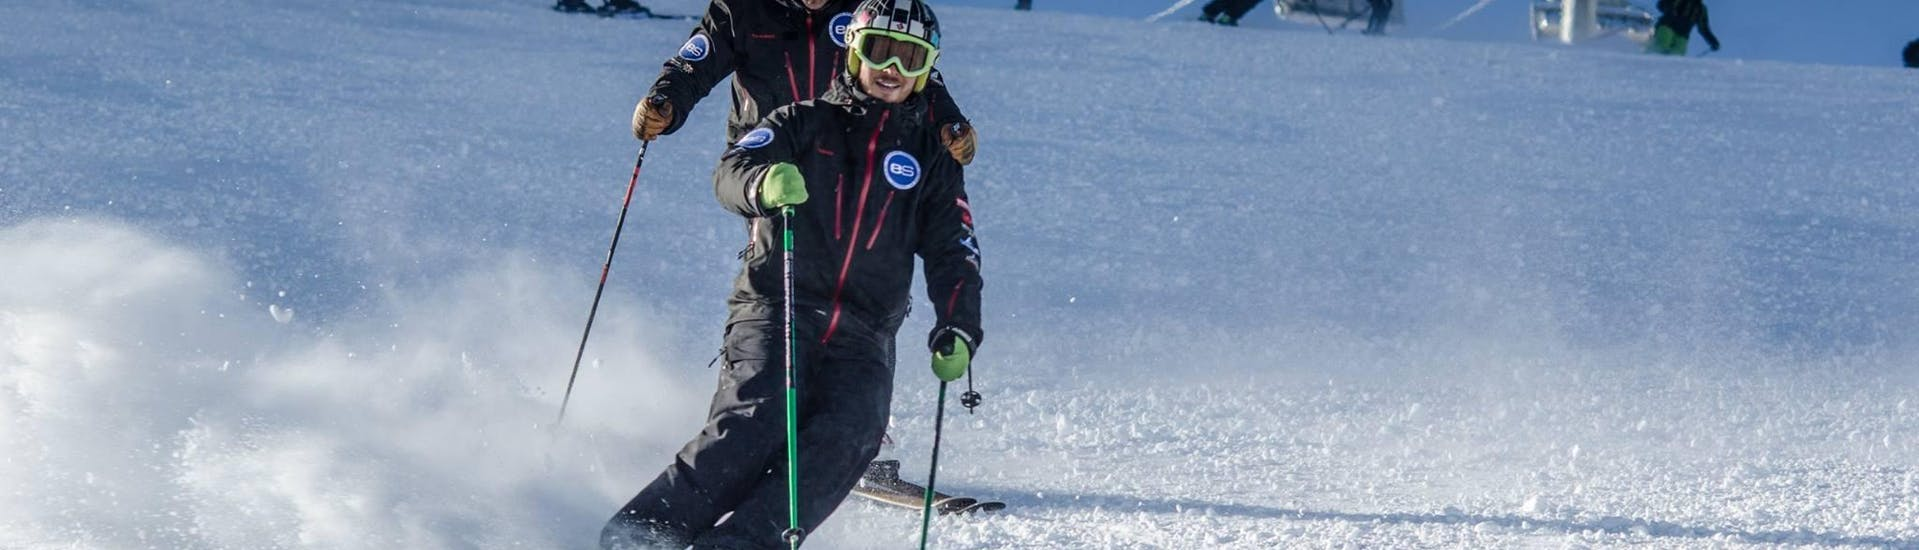 "Ski Lessons ""Freeski"" Half Day (11-17 years) - Advanced with European Snowsport Zermatt - Hero image"